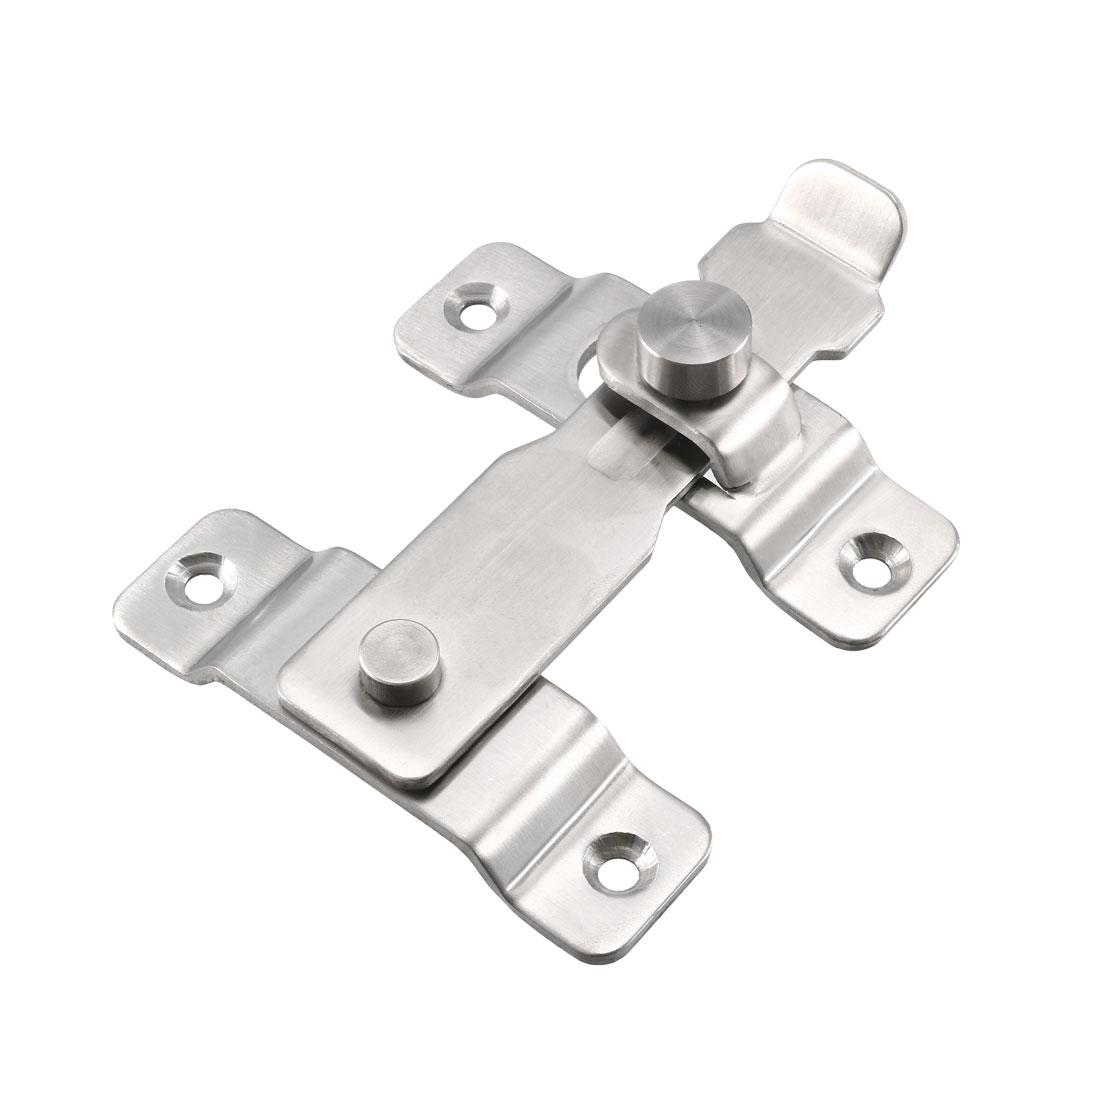 Flip Door Latch 201 Stainless Steel 110x85mm Gate Latch Bar Latch Sliding Lock